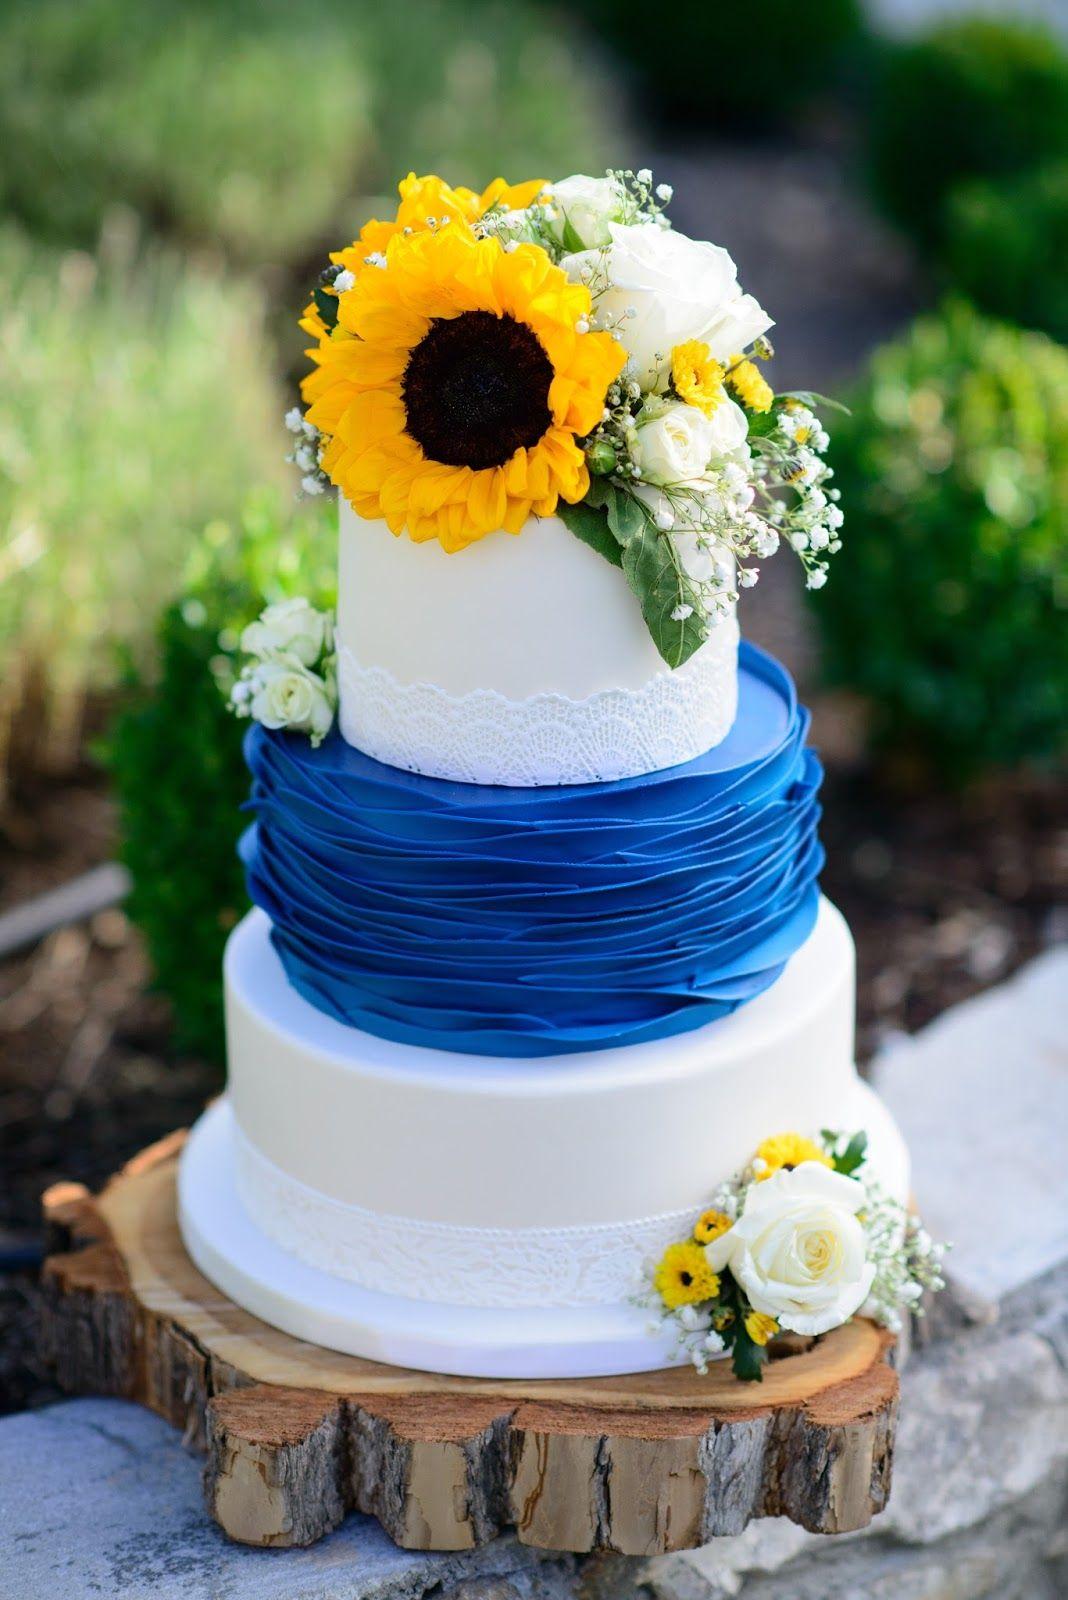 Best of 2018: Wedding Cakes - nouba.com.au - Best of 2018